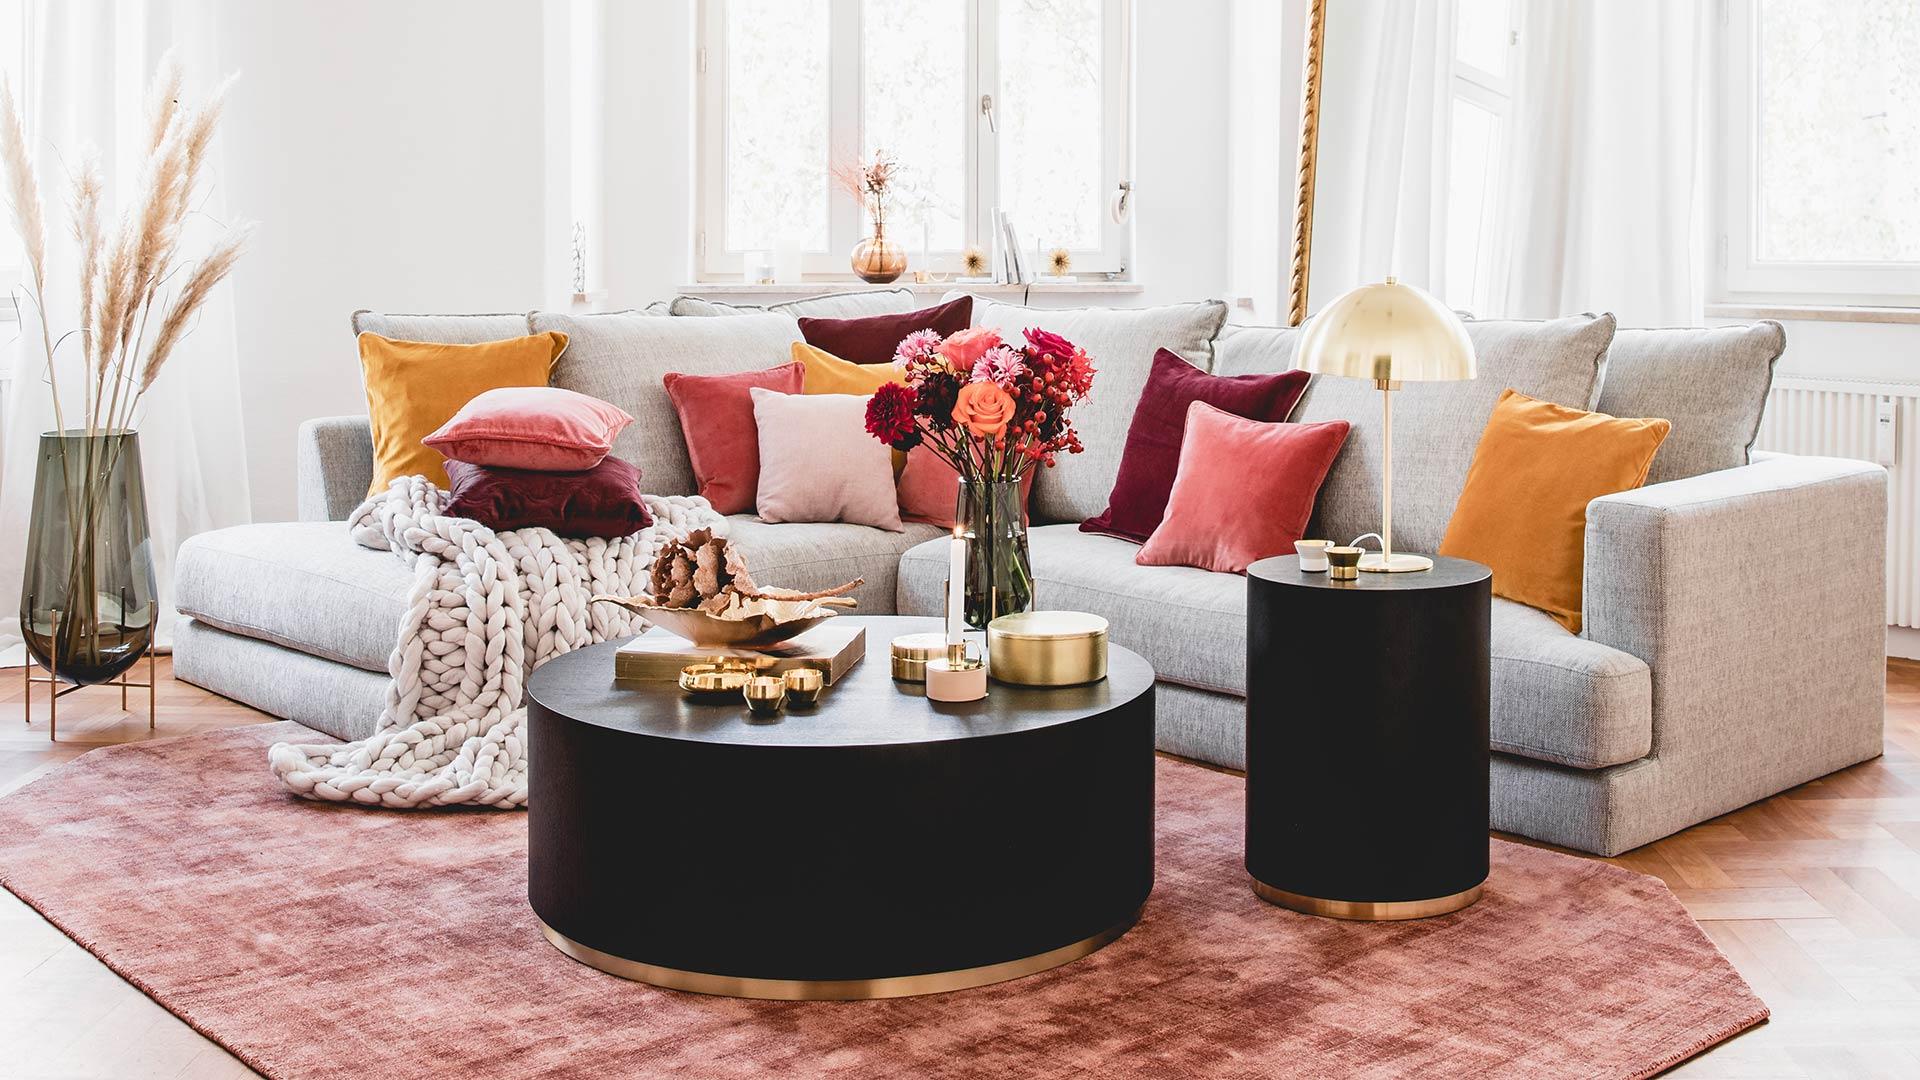 Sofa-Styling: 70s